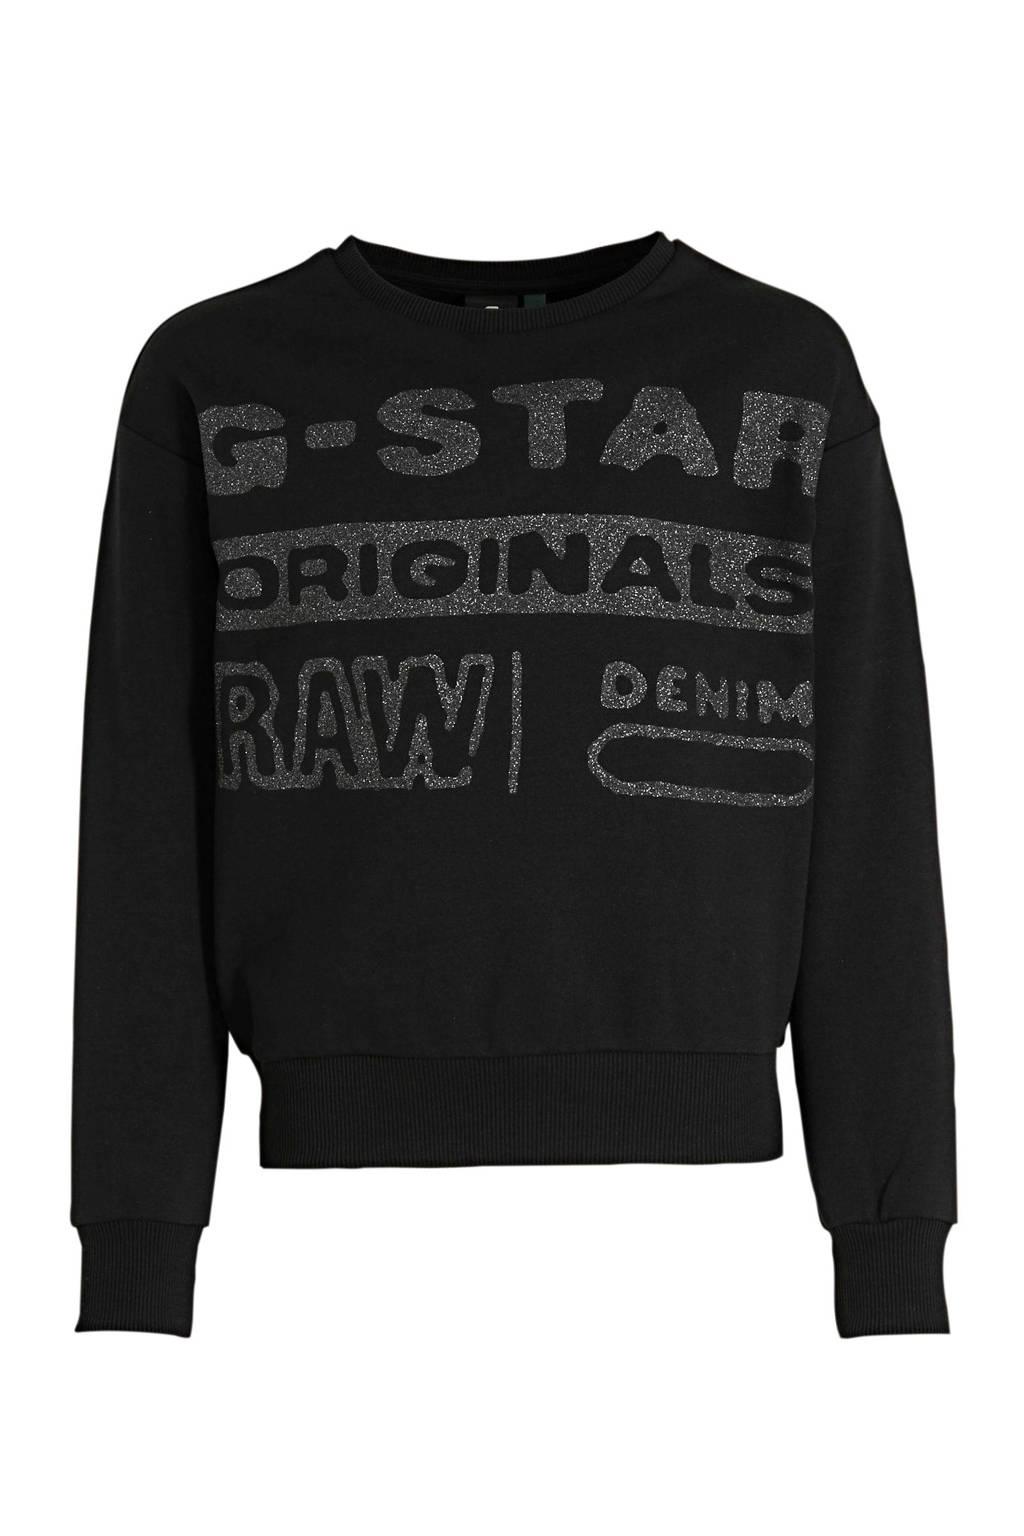 G-Star RAW sweater met logo zwart, Zwart